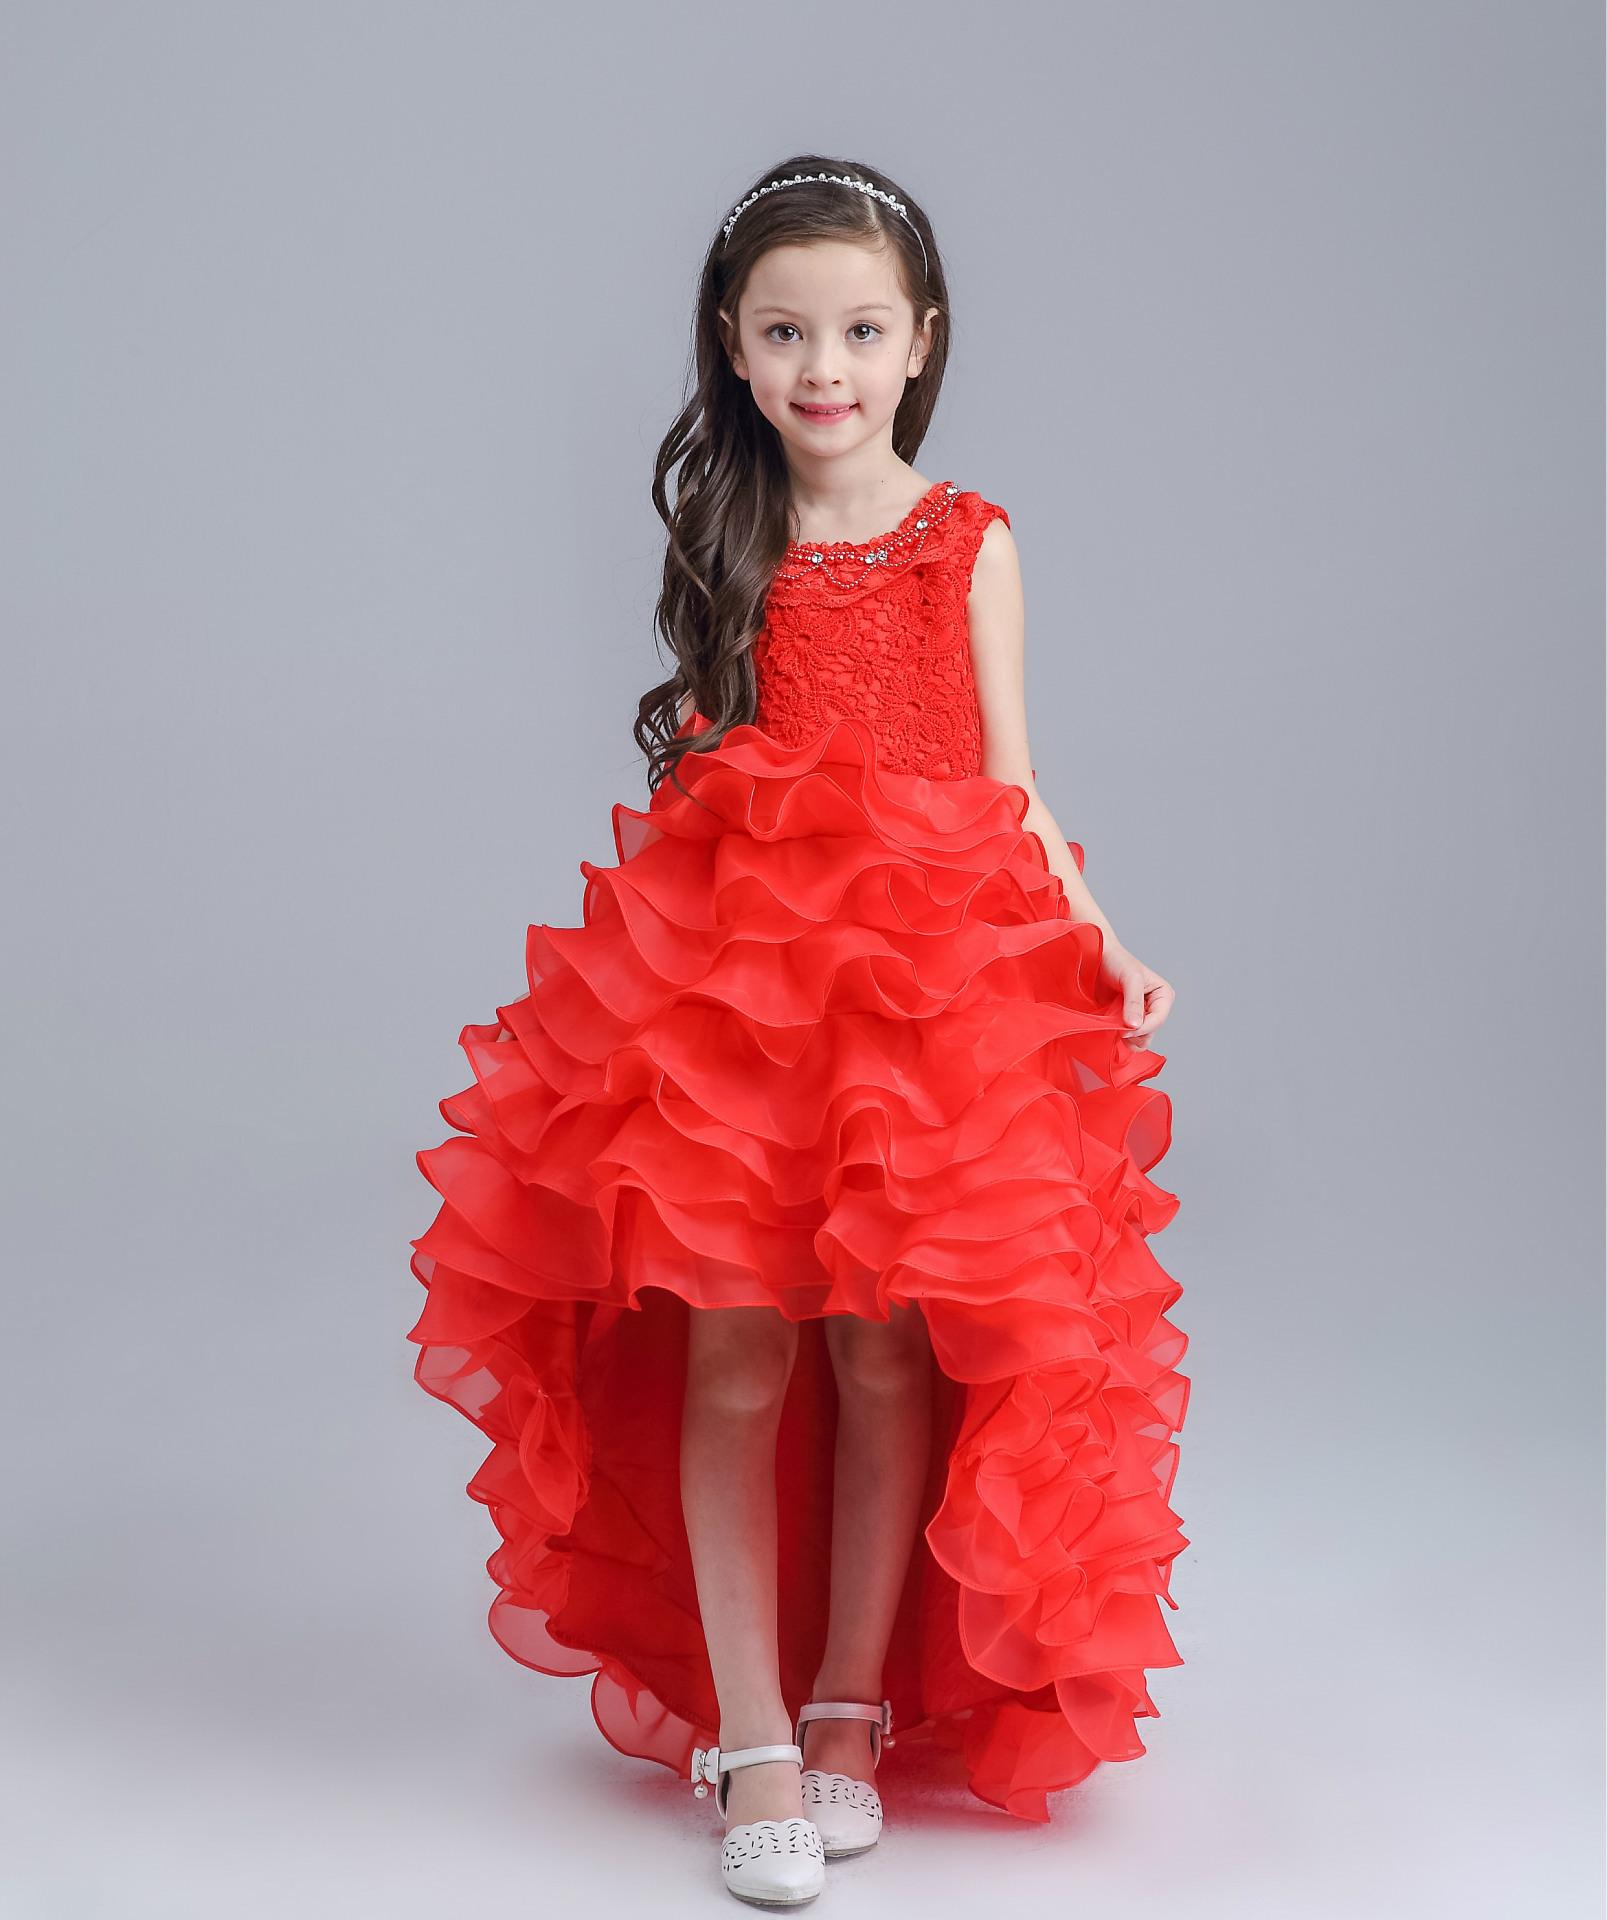 e9e717a31 Teenage Long Tailed Girls Summer Dress Kids Girls Red White Wedding ...